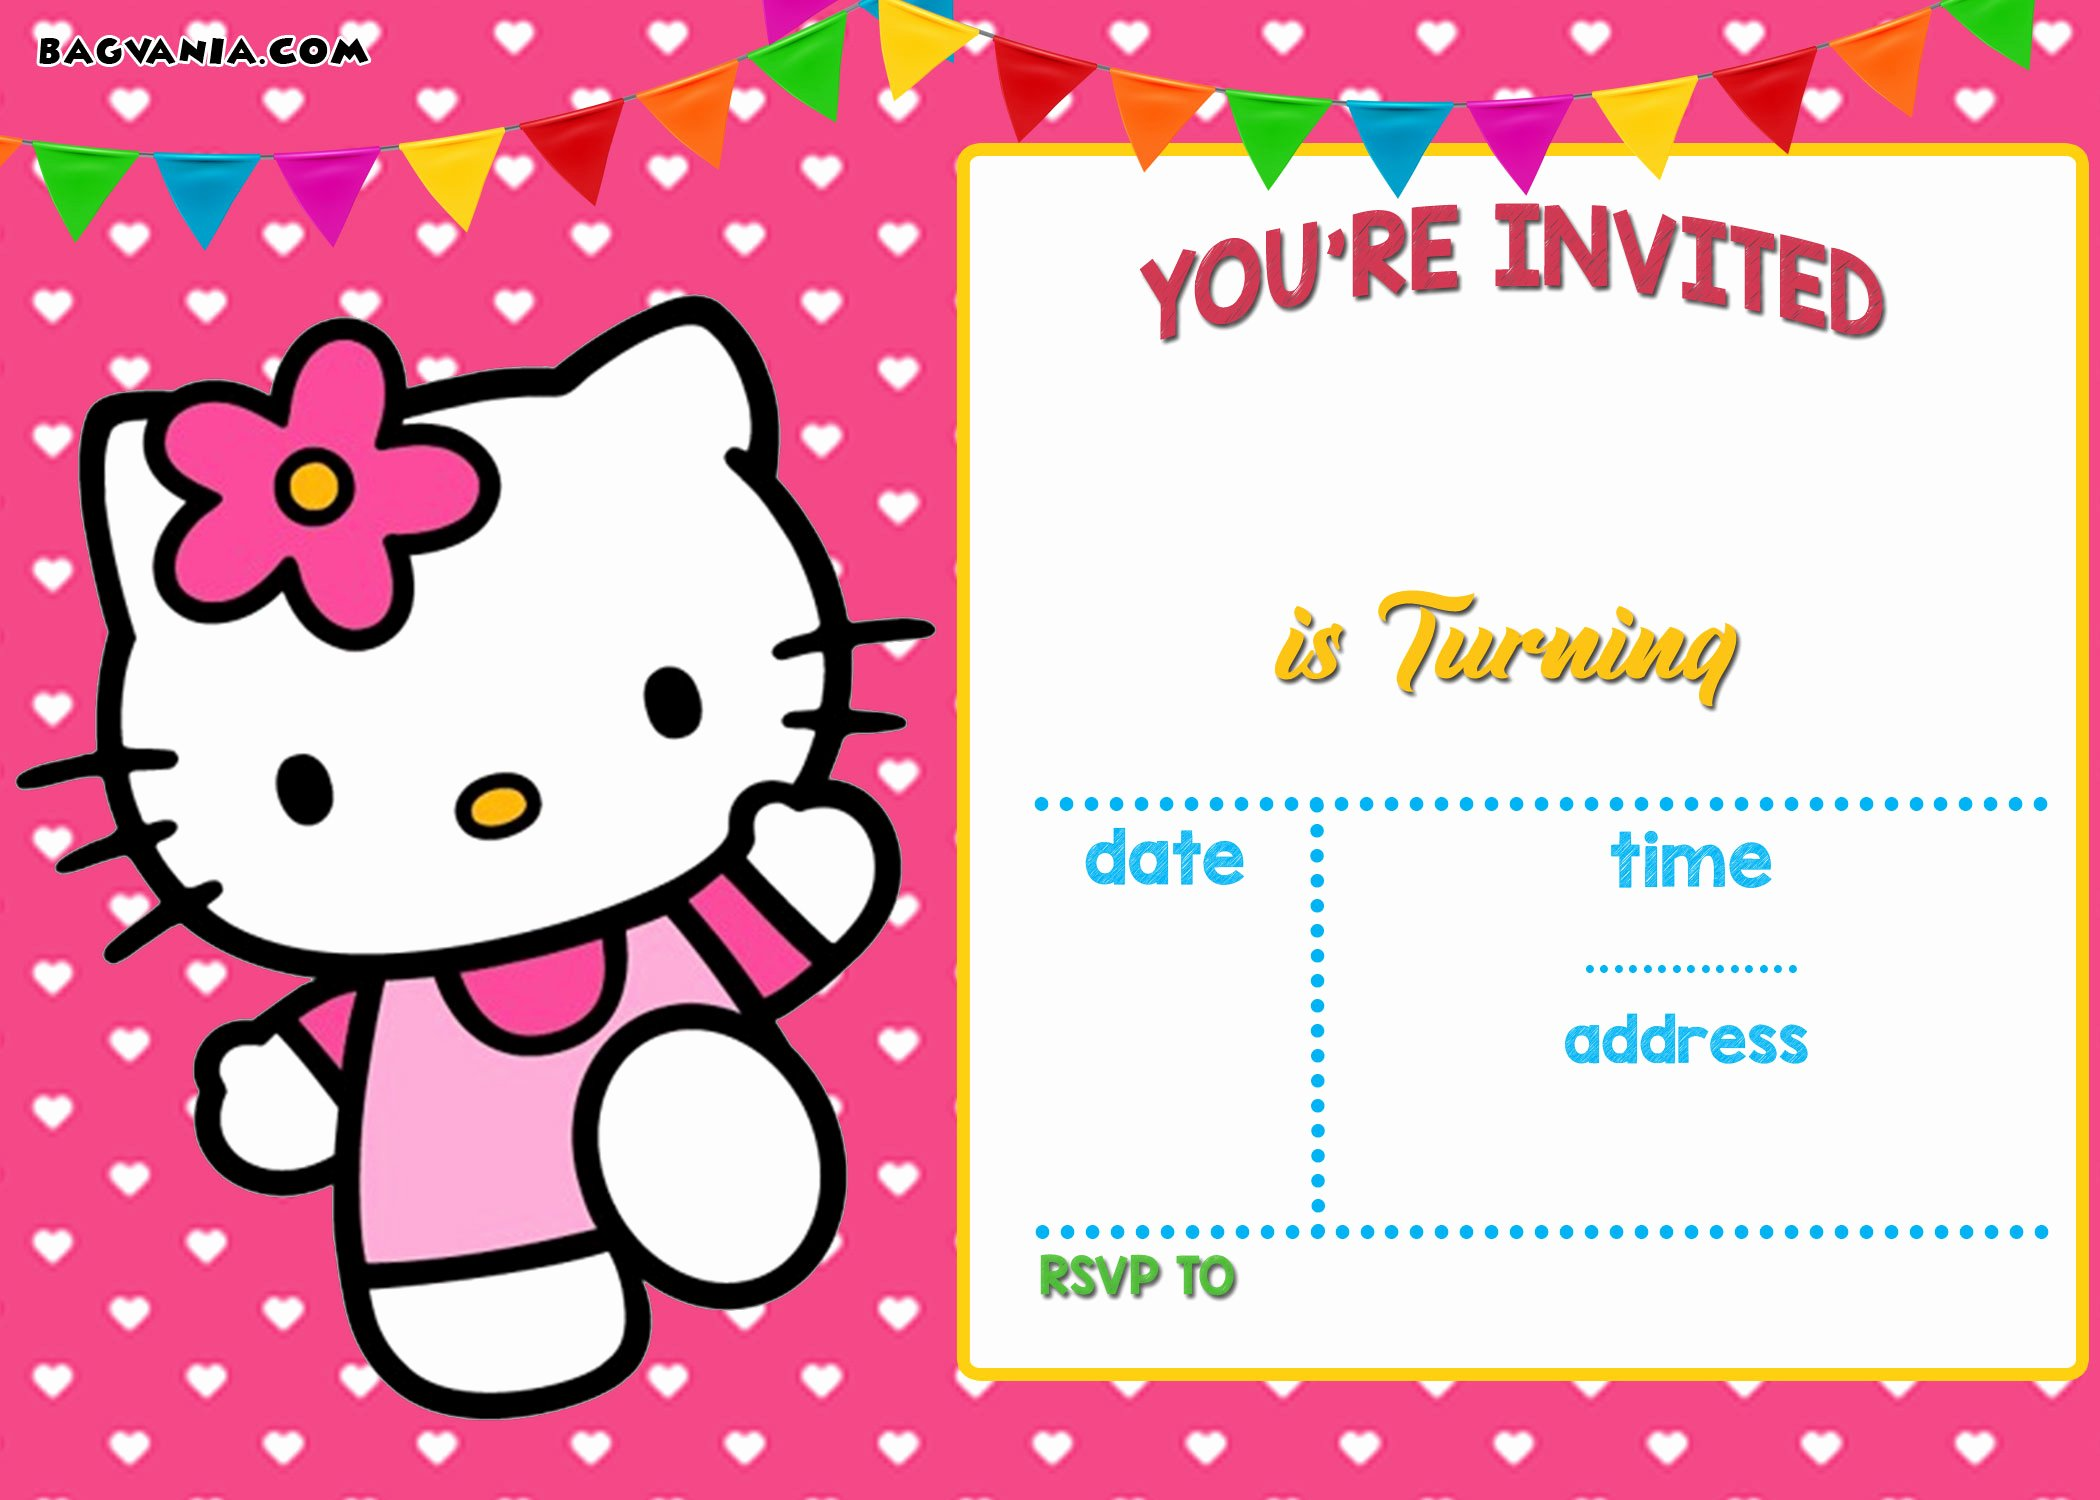 Personalized Hello Kitty Birthday Invitations Unique Free Personalized Hello Kitty Birthday Invitations